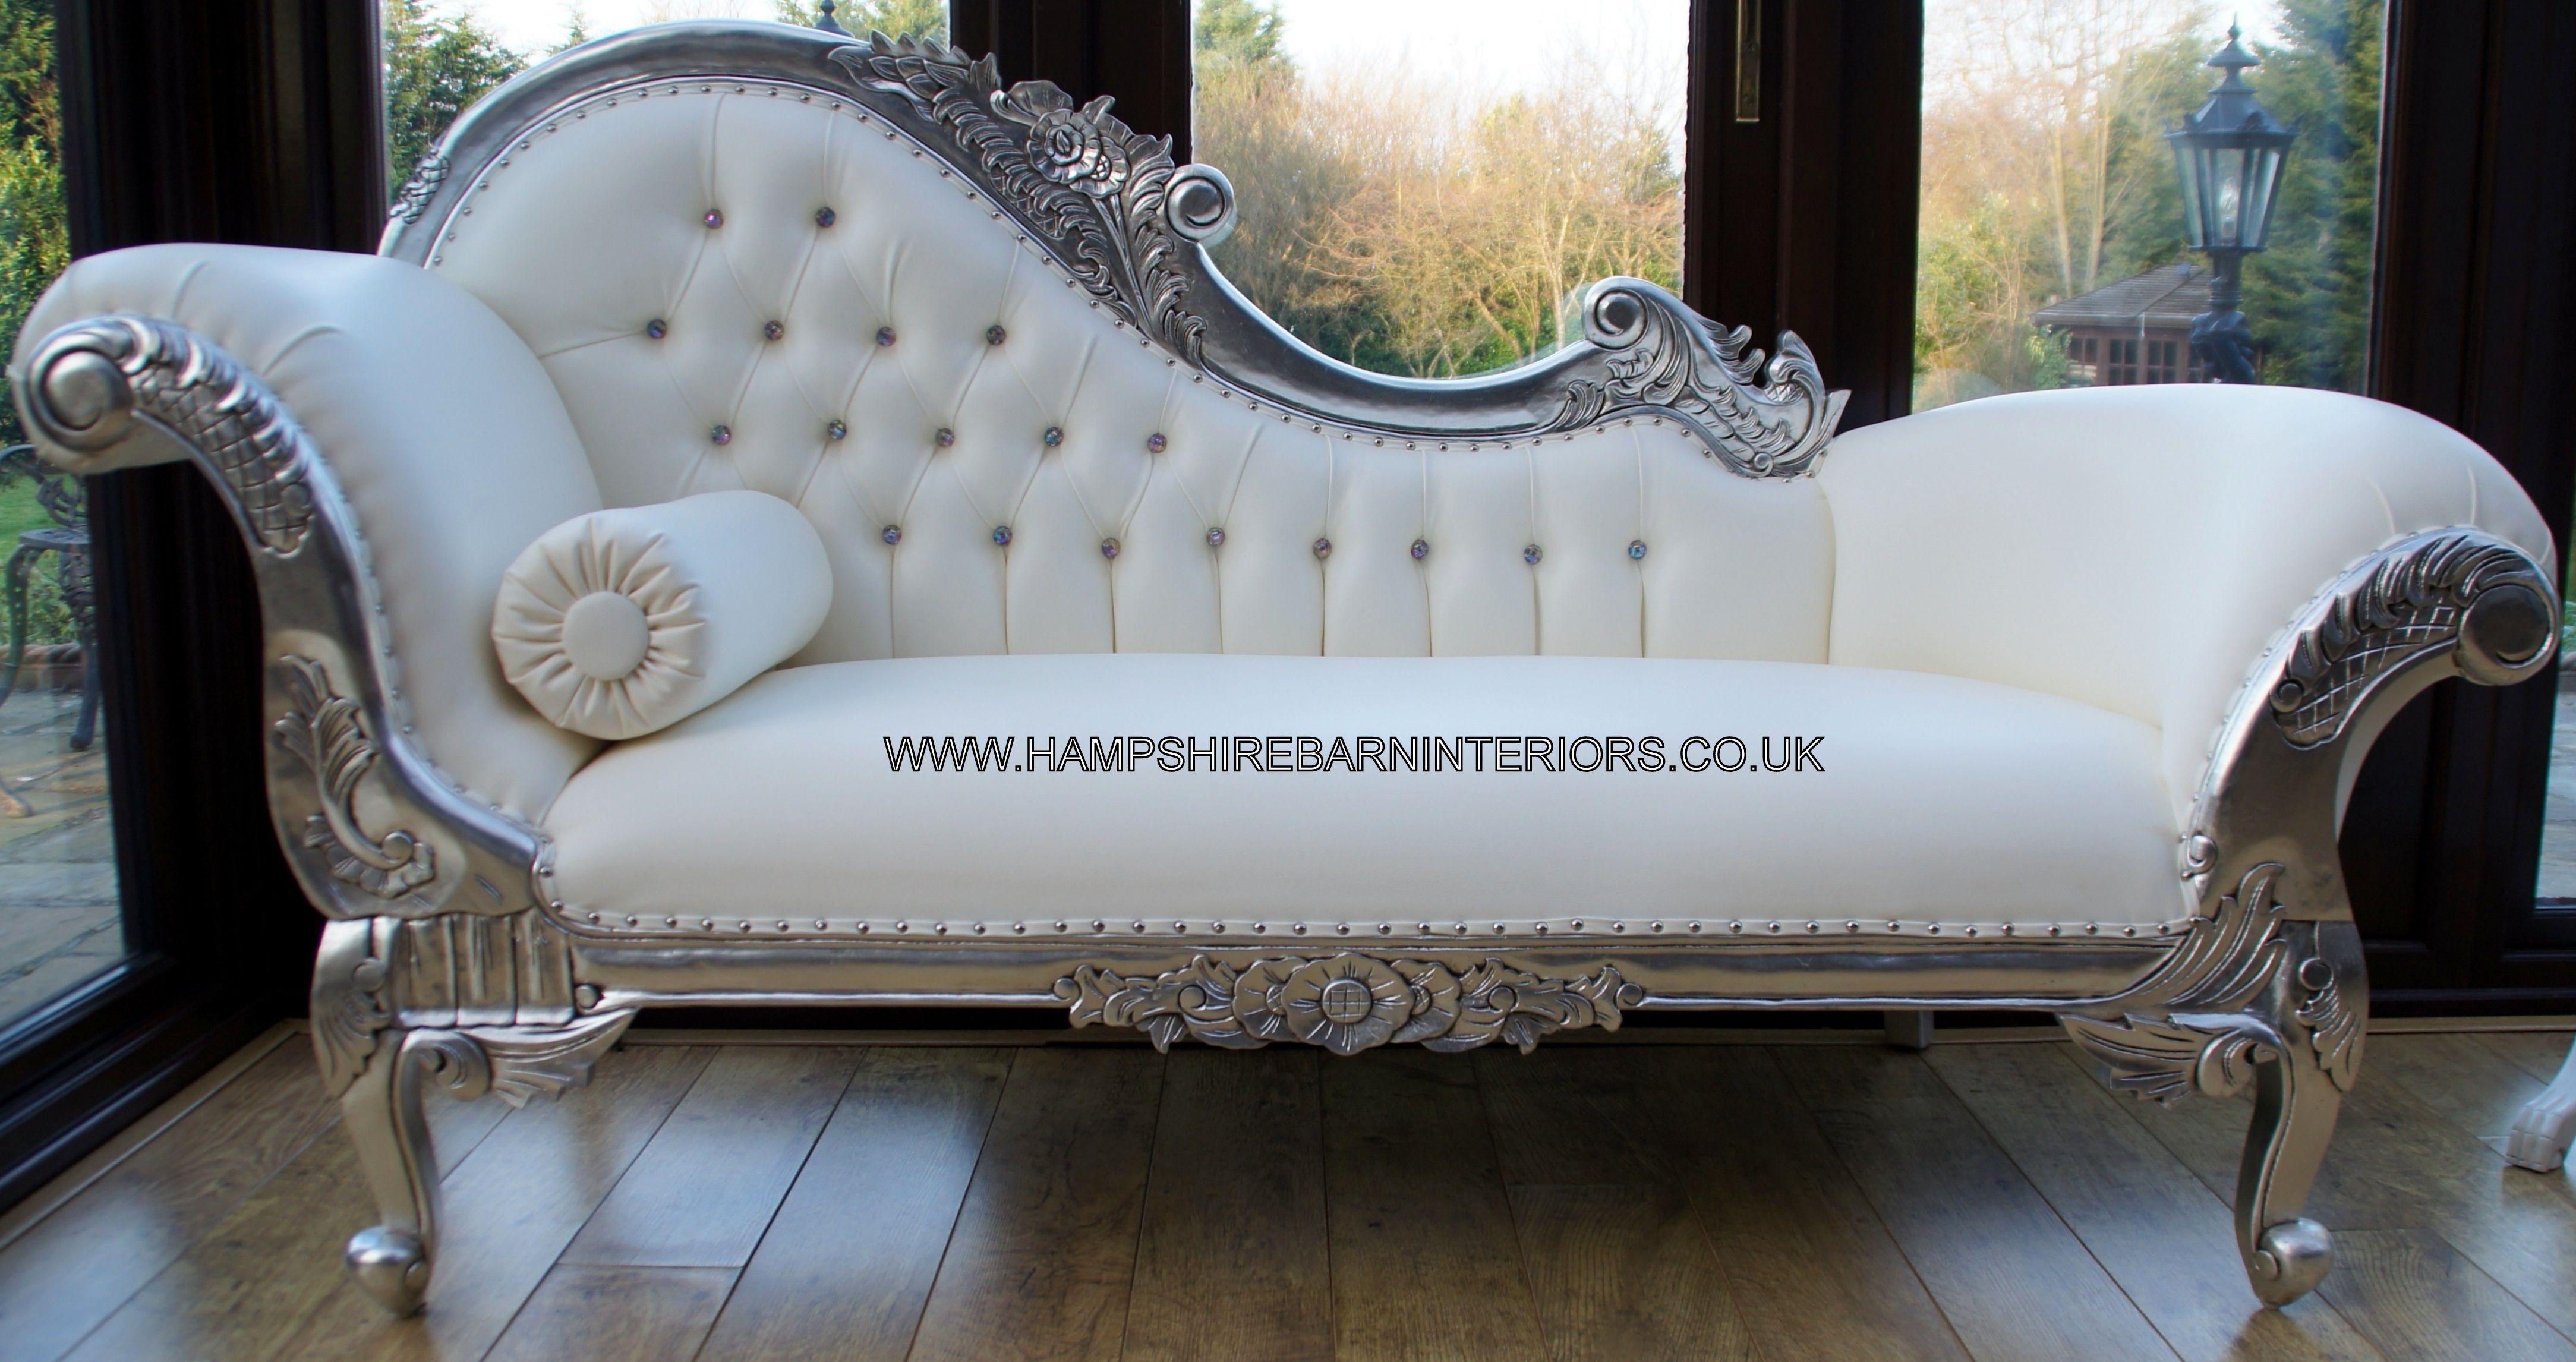 White Leather Chaise Lounge | Дизайн мебели, Дизайн ...